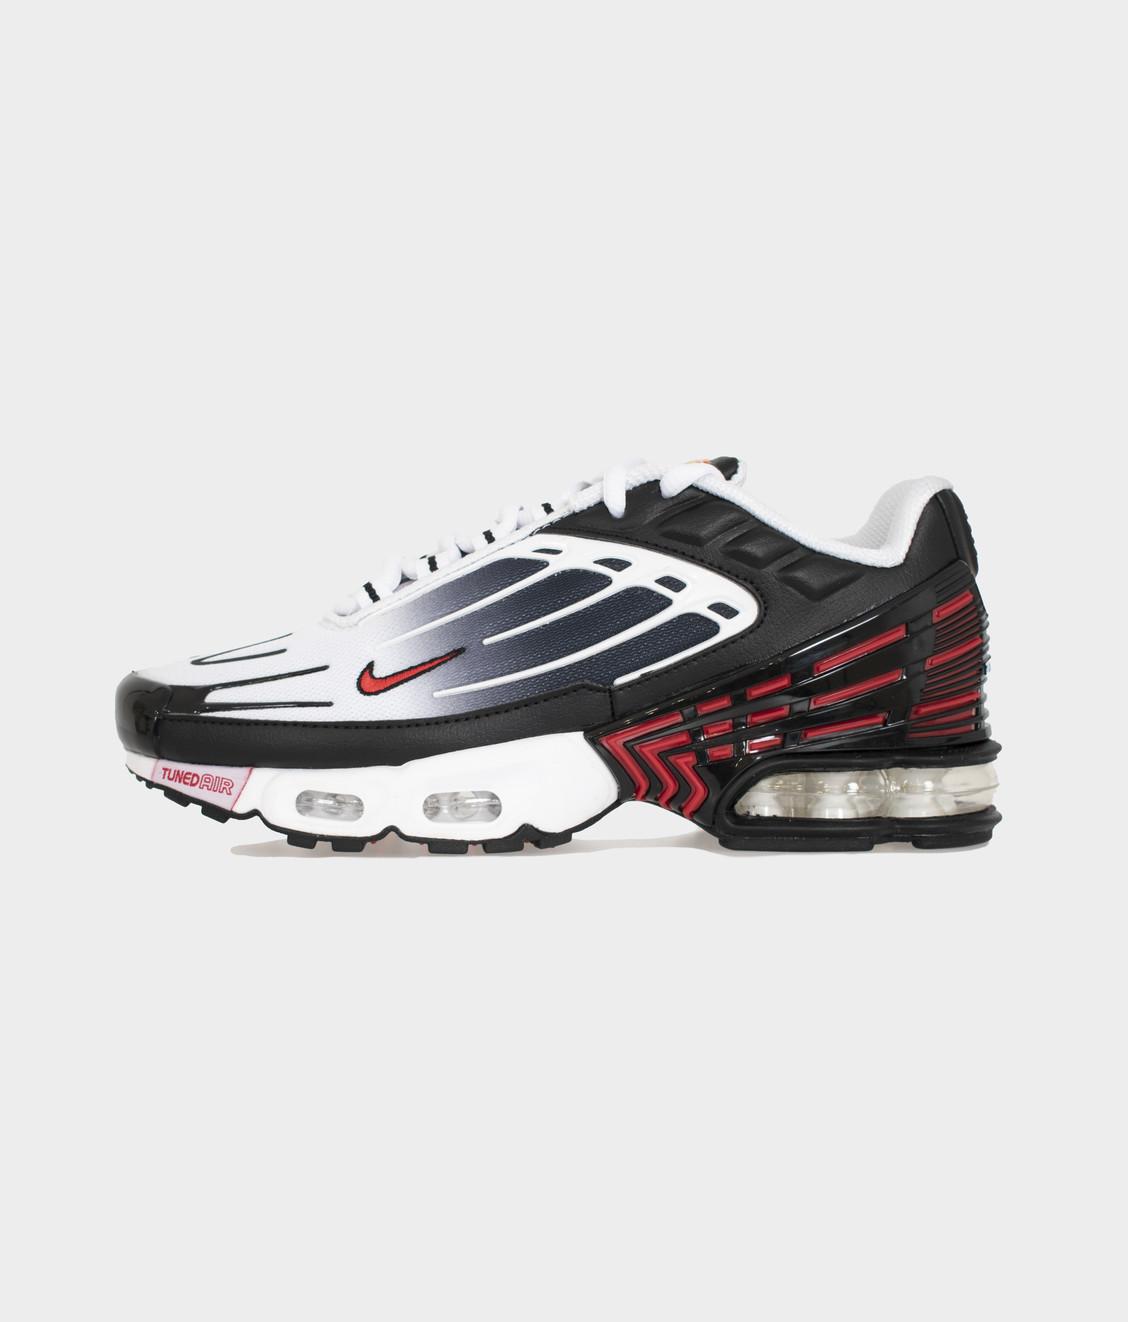 Nike Nike Air Max Plus III Black University Red